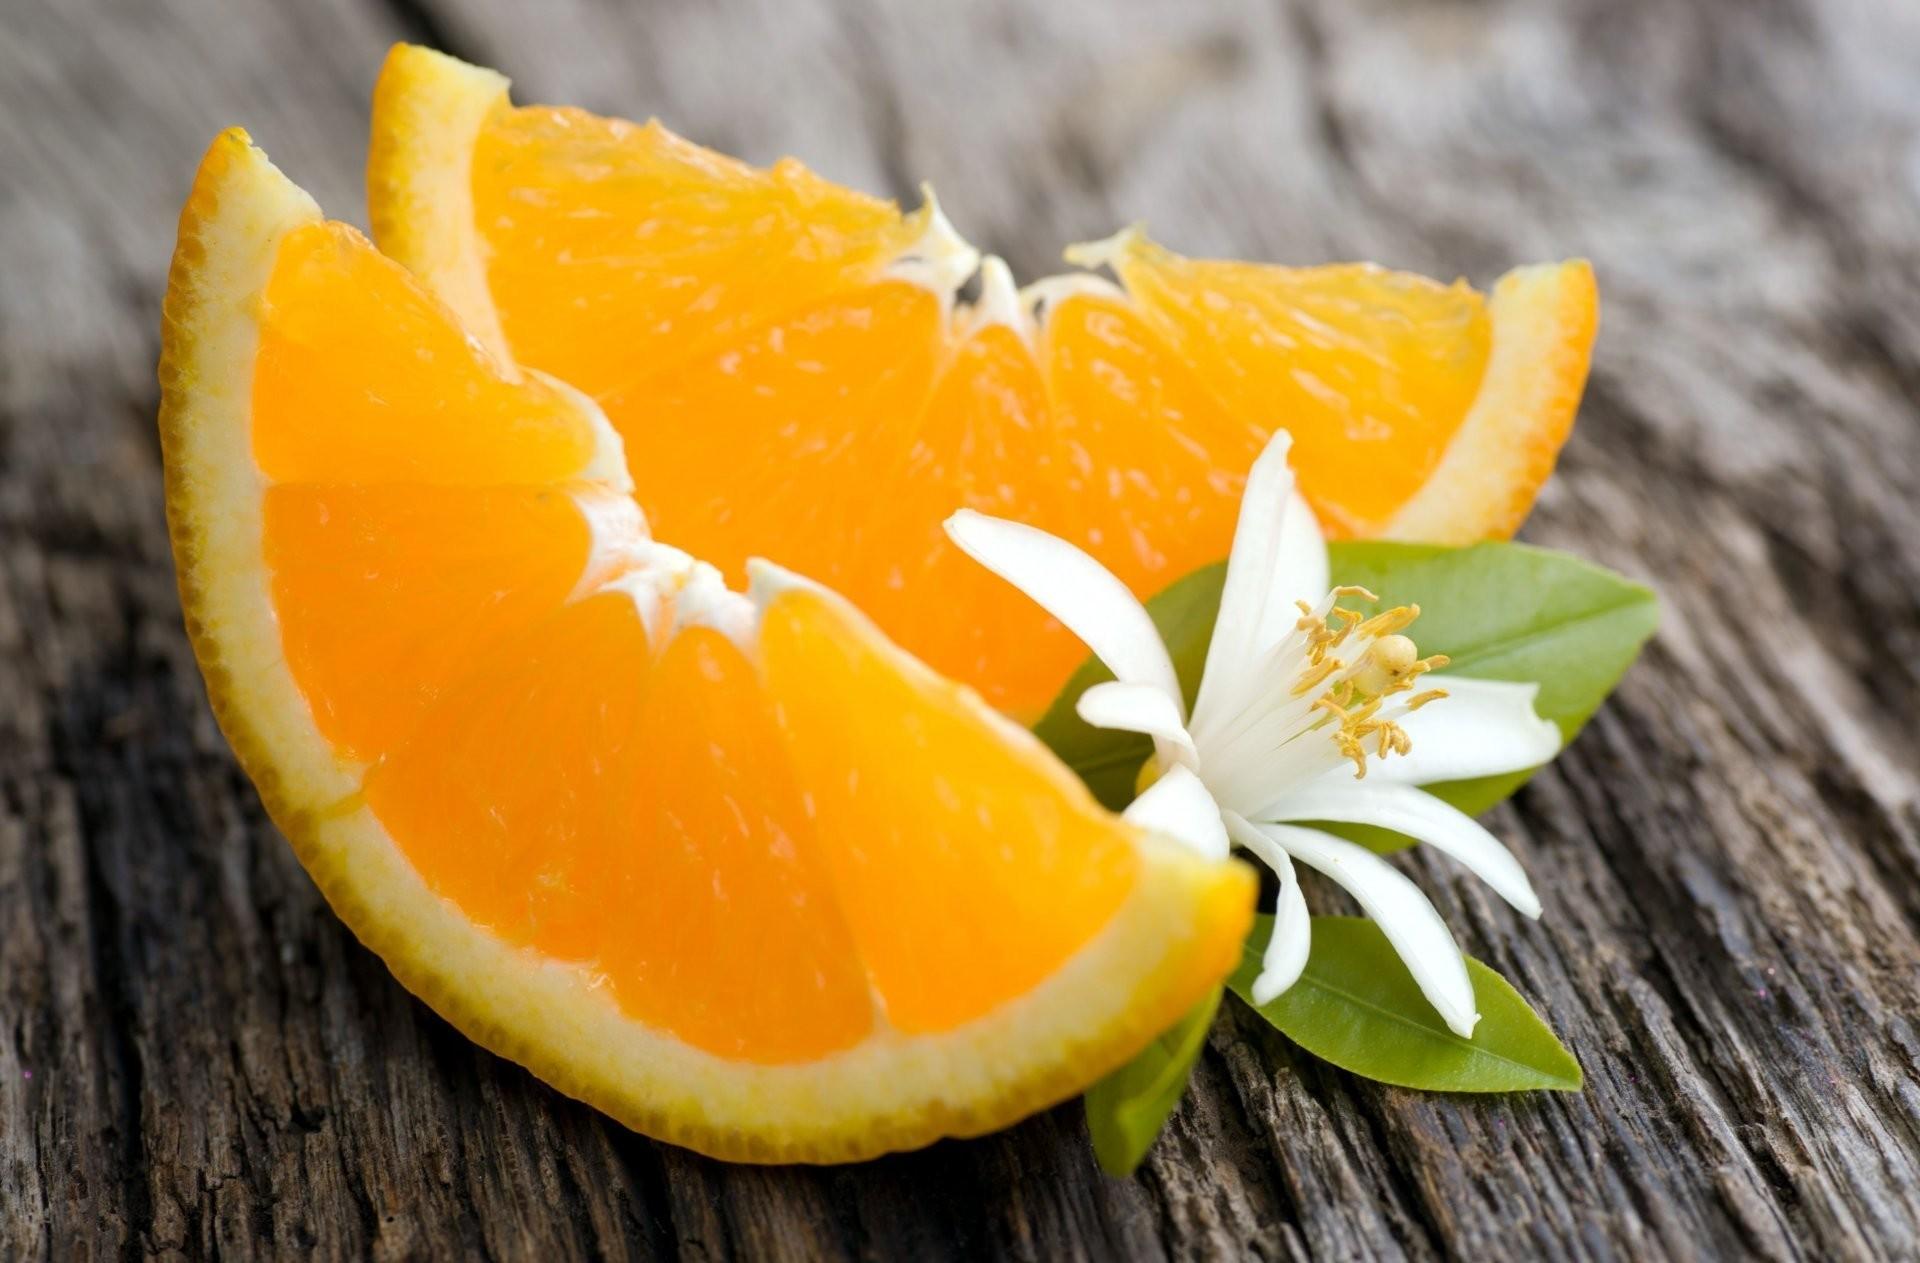 food orange segments orange flower flower leaf background wallpaper  widescreen full screen widescreen hd wallpapers background